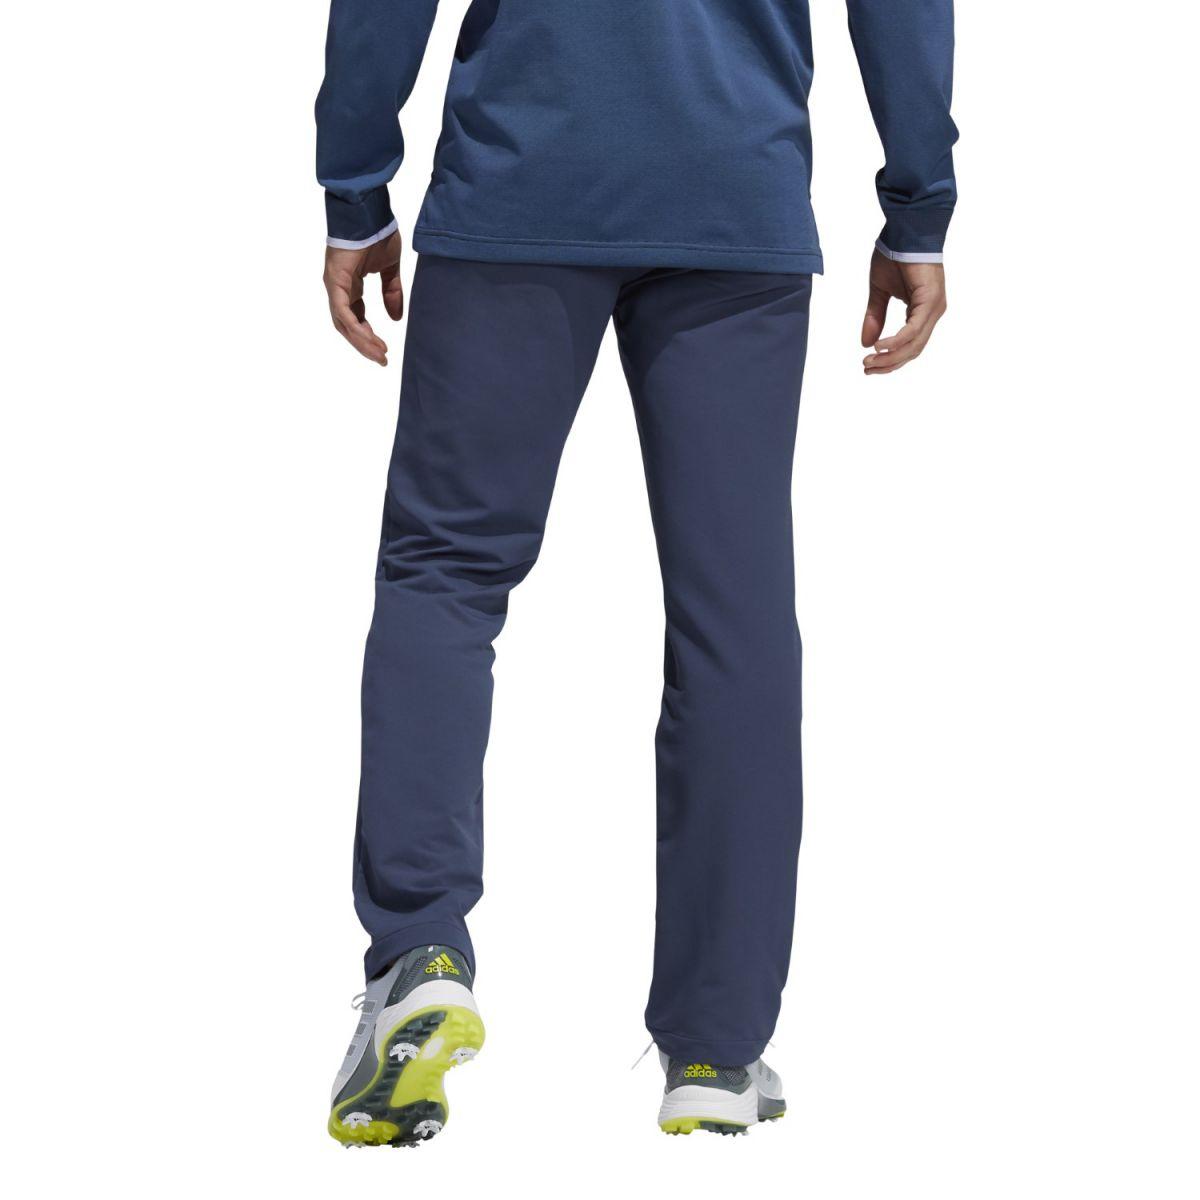 adidas pant fall weight navy 3032